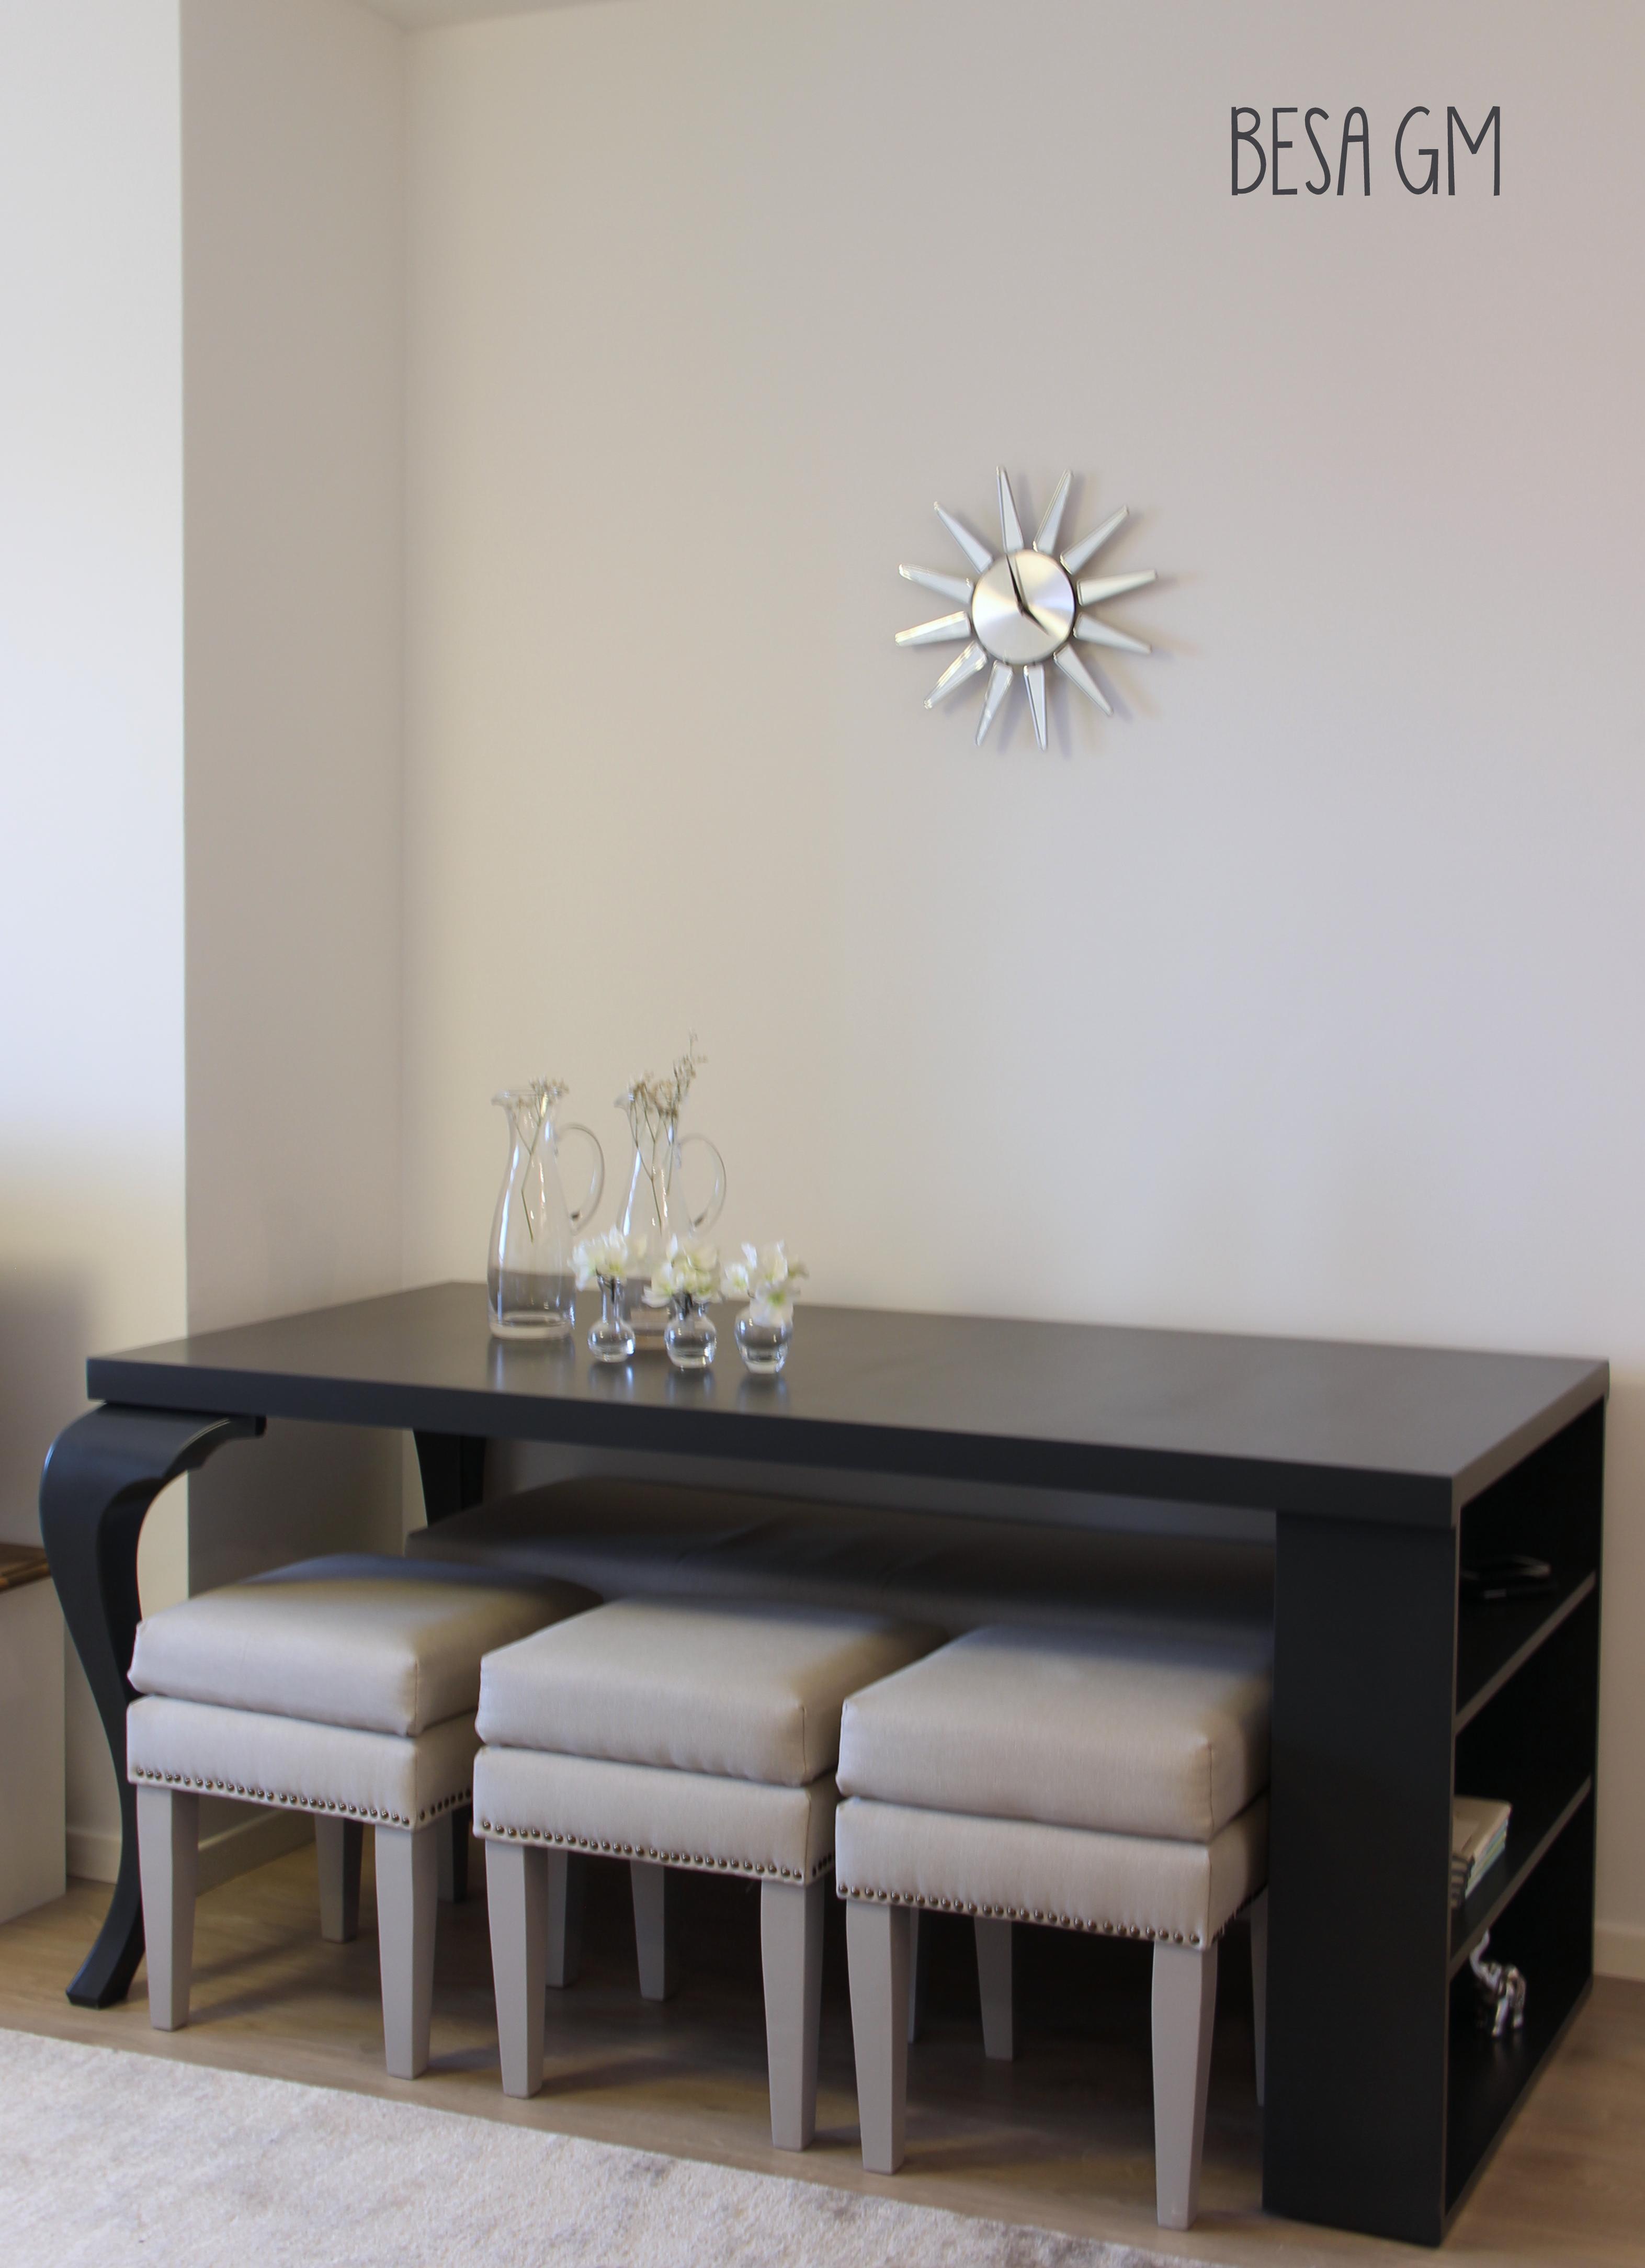 Remarkable Custom Dinning Table Set Besa Gm Dailytribune Chair Design For Home Dailytribuneorg